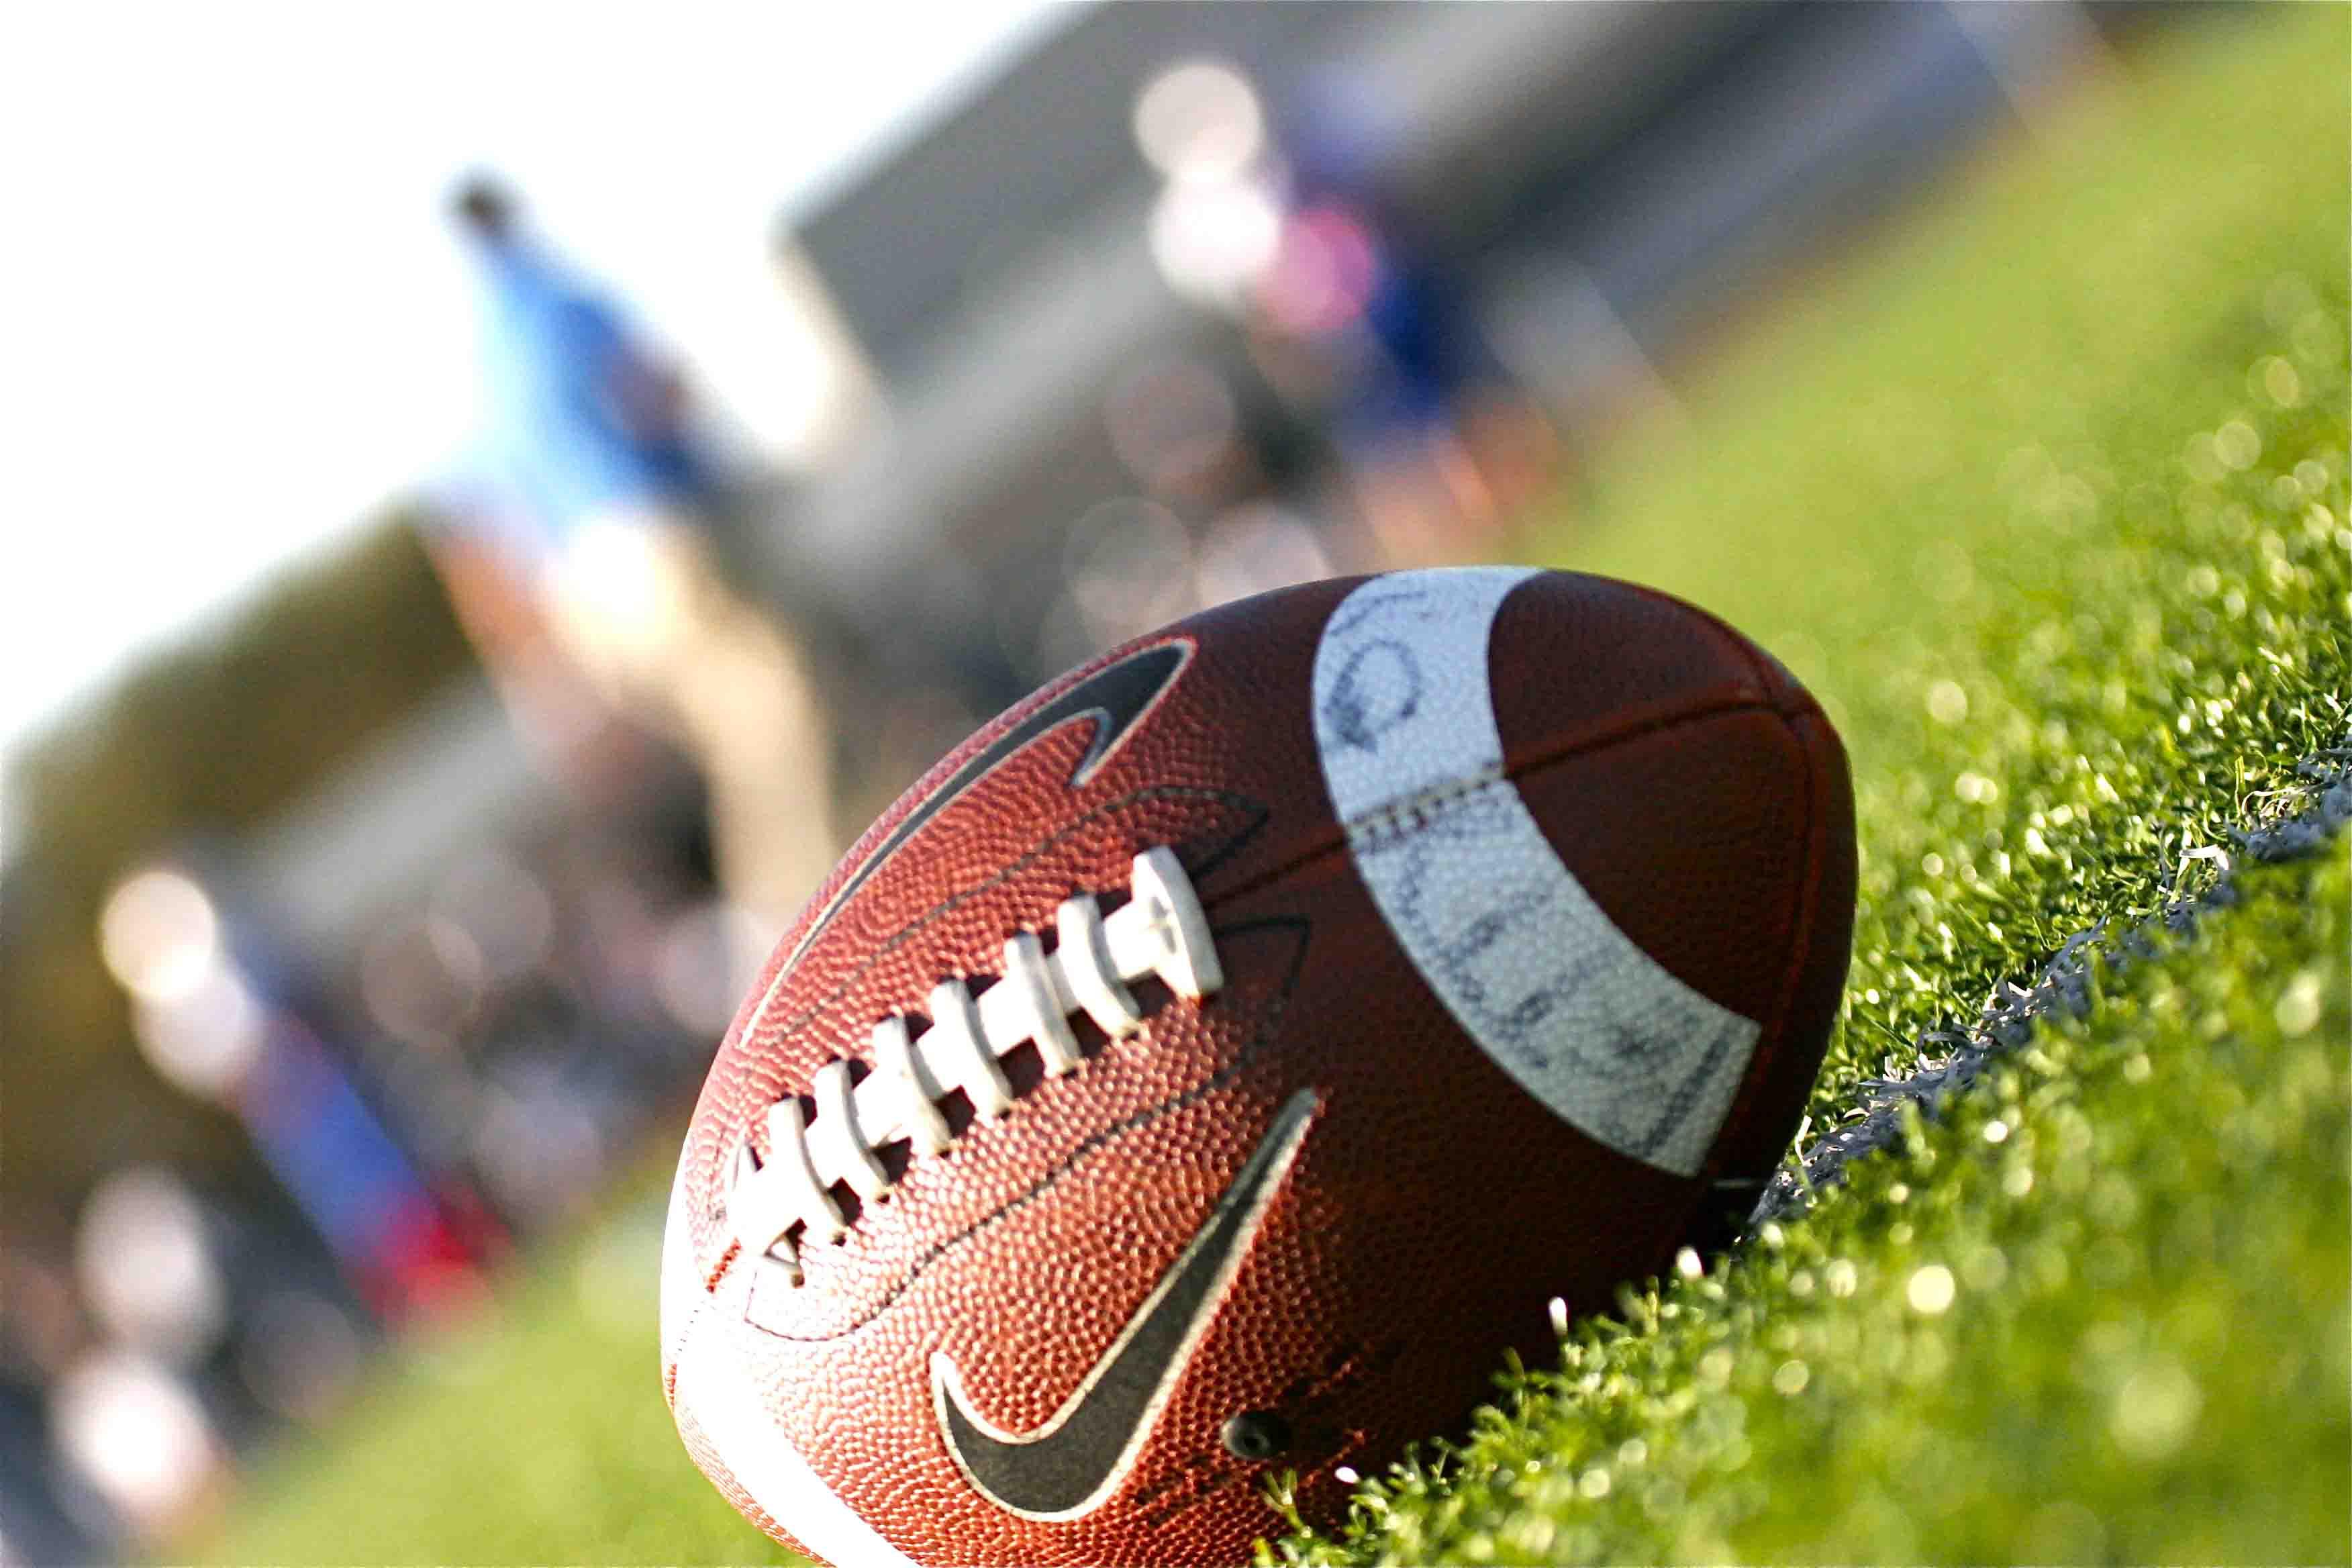 2016 College Football Schedule of Texas Football Teams